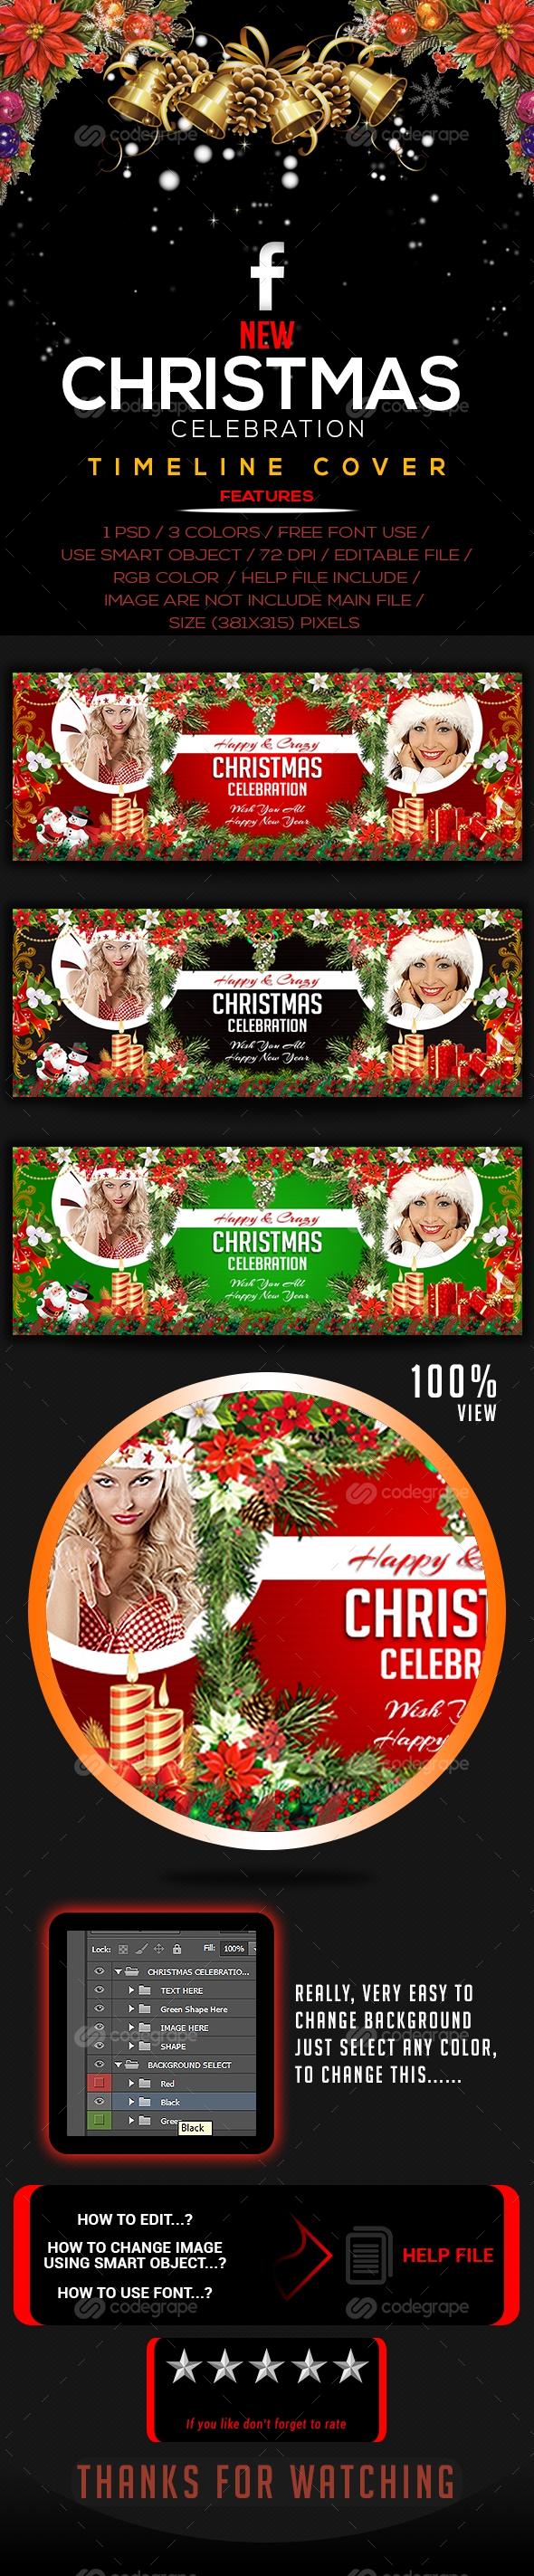 Christmas Celebration Timeline Covers